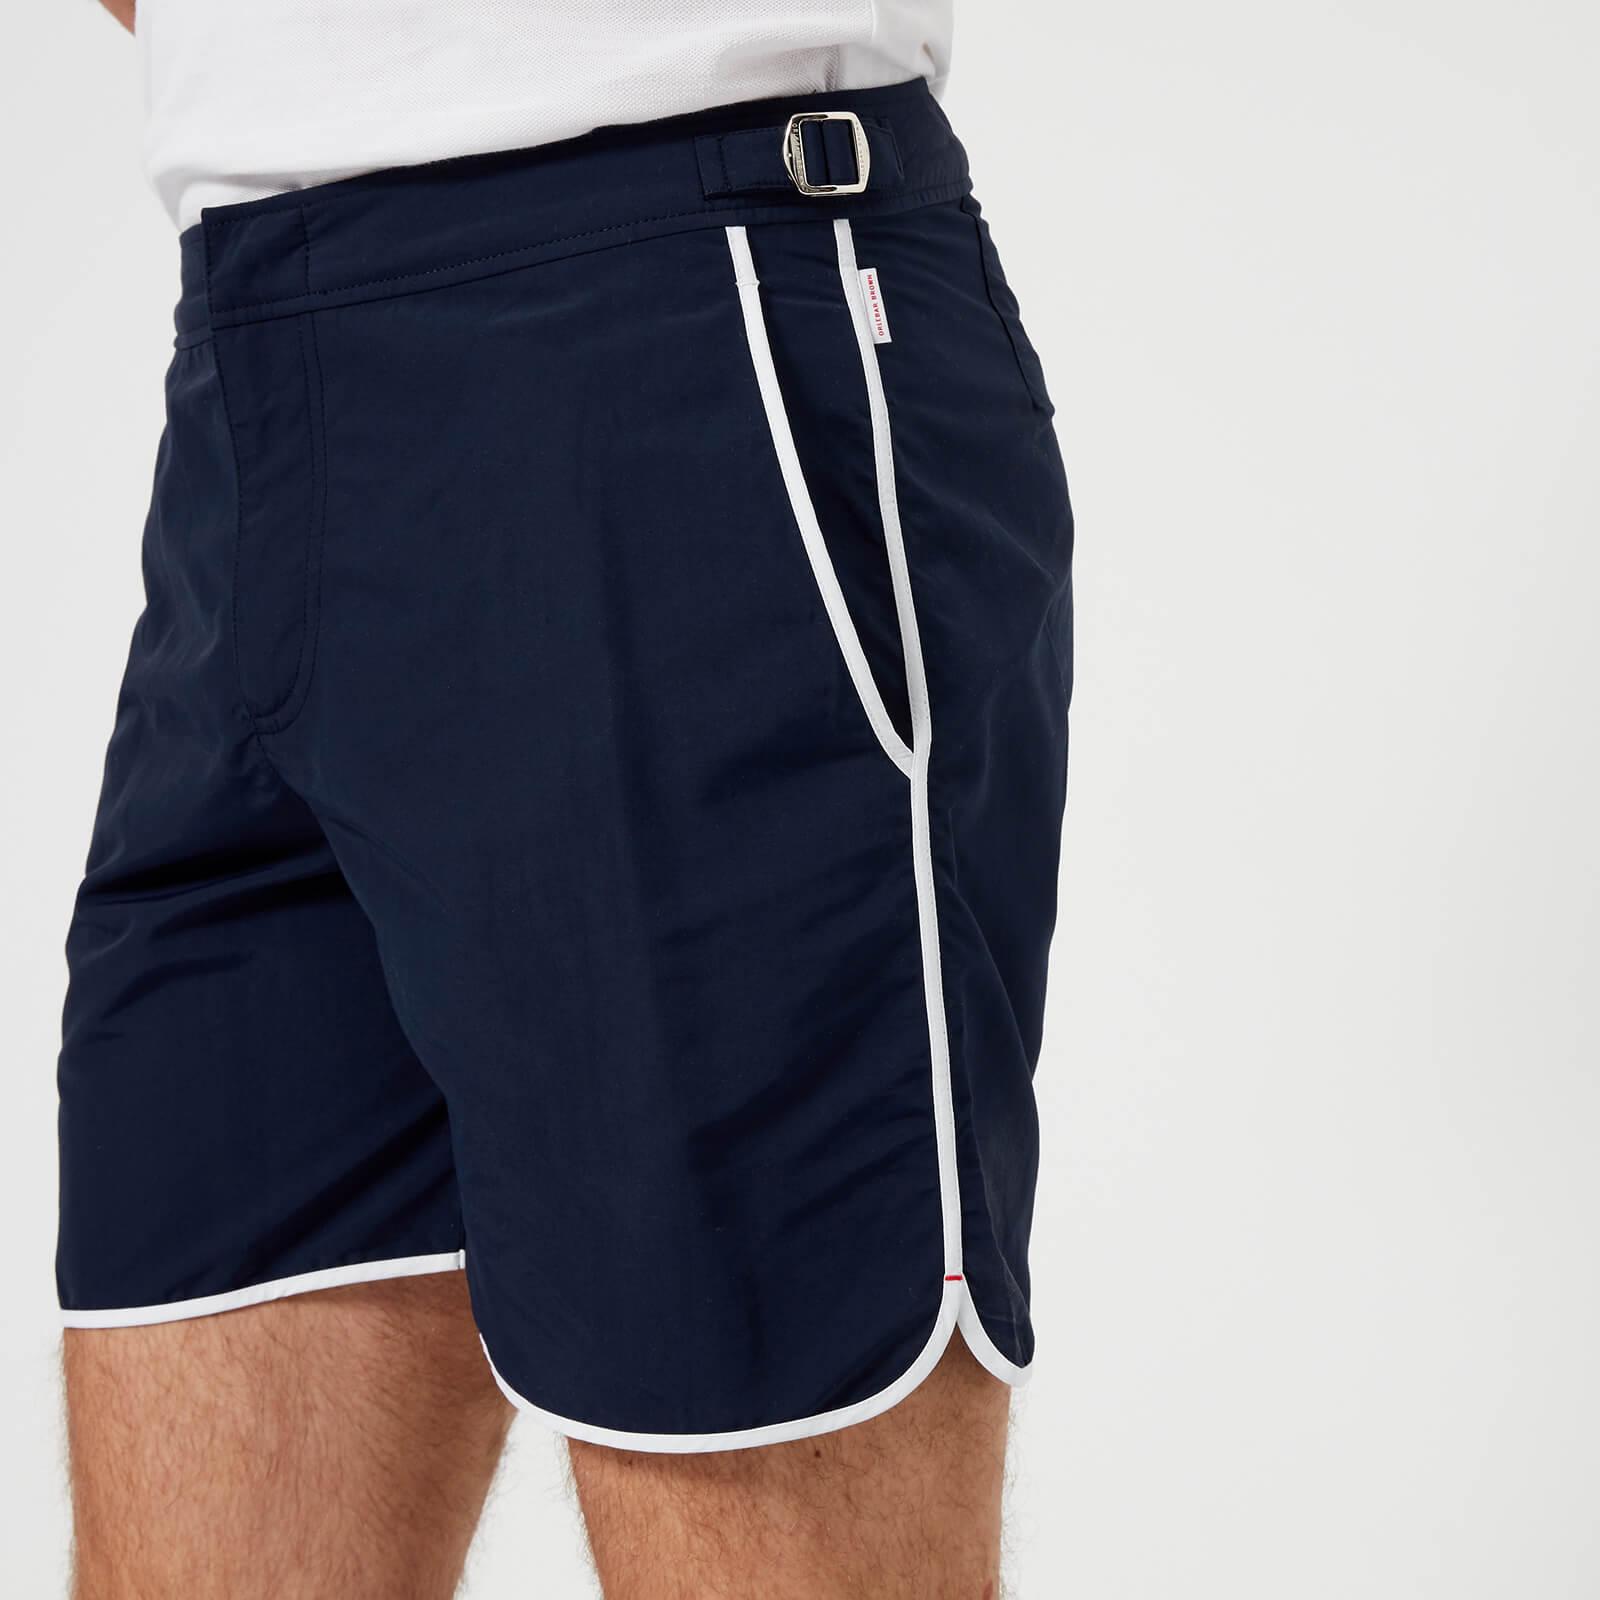 1d5d1bbd33 Orlebar Brown Men's Bulldog Binding Swim Shorts - Navy/White - Free UK  Delivery over £50